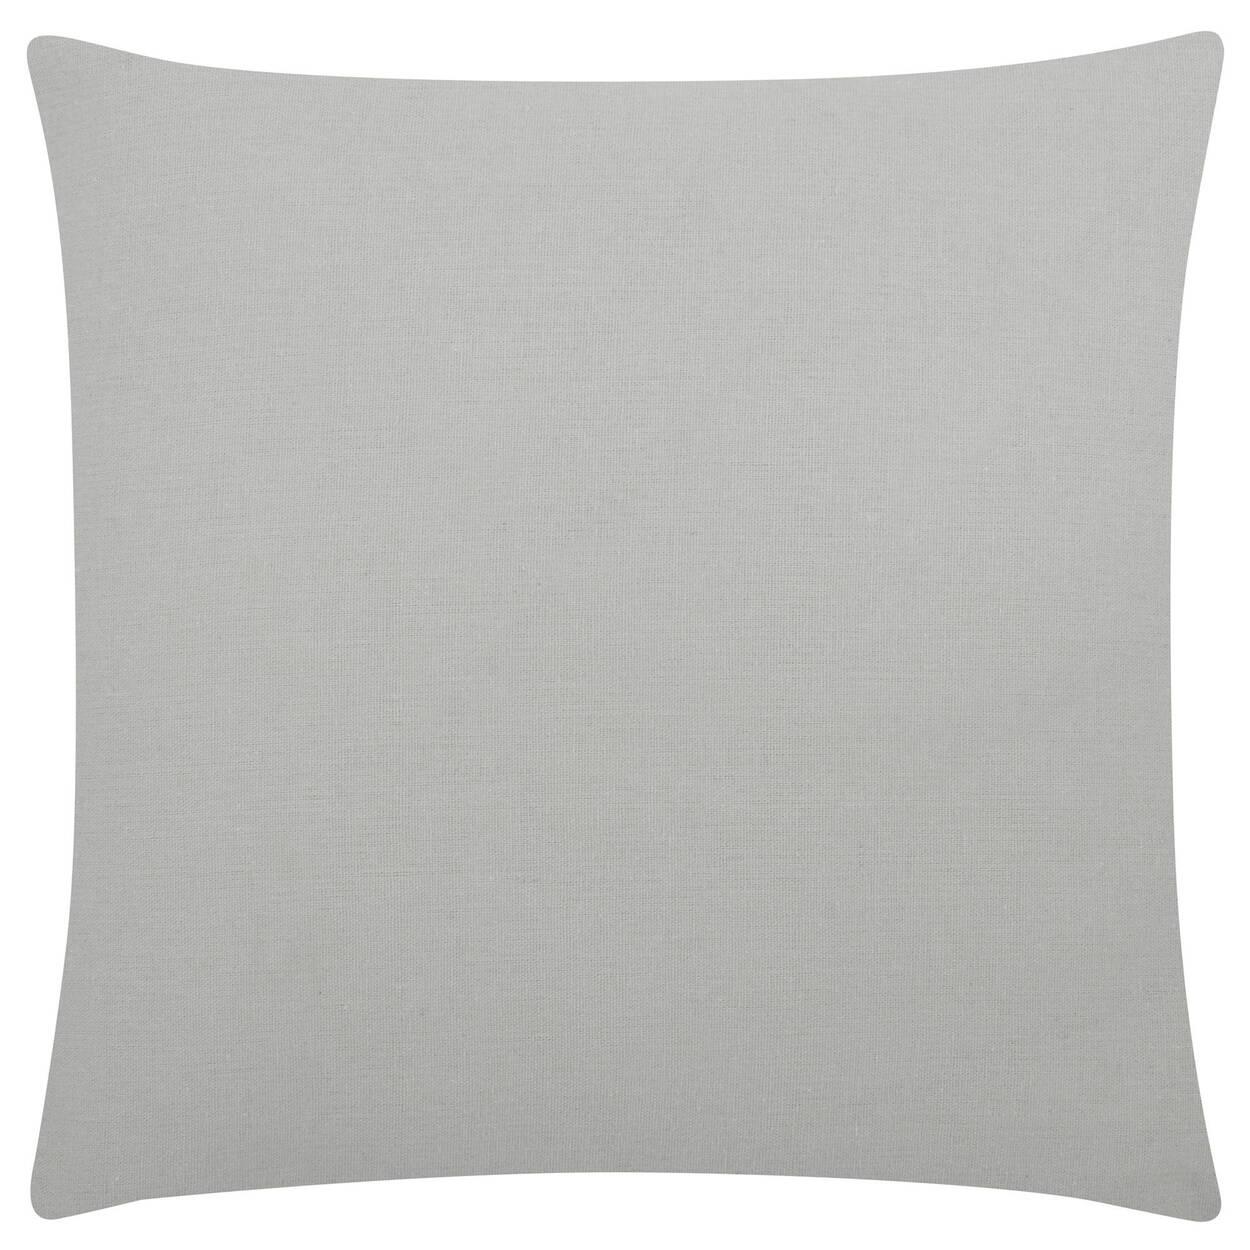 "Bark Decorative Pillow Cover 18"" X 18"""